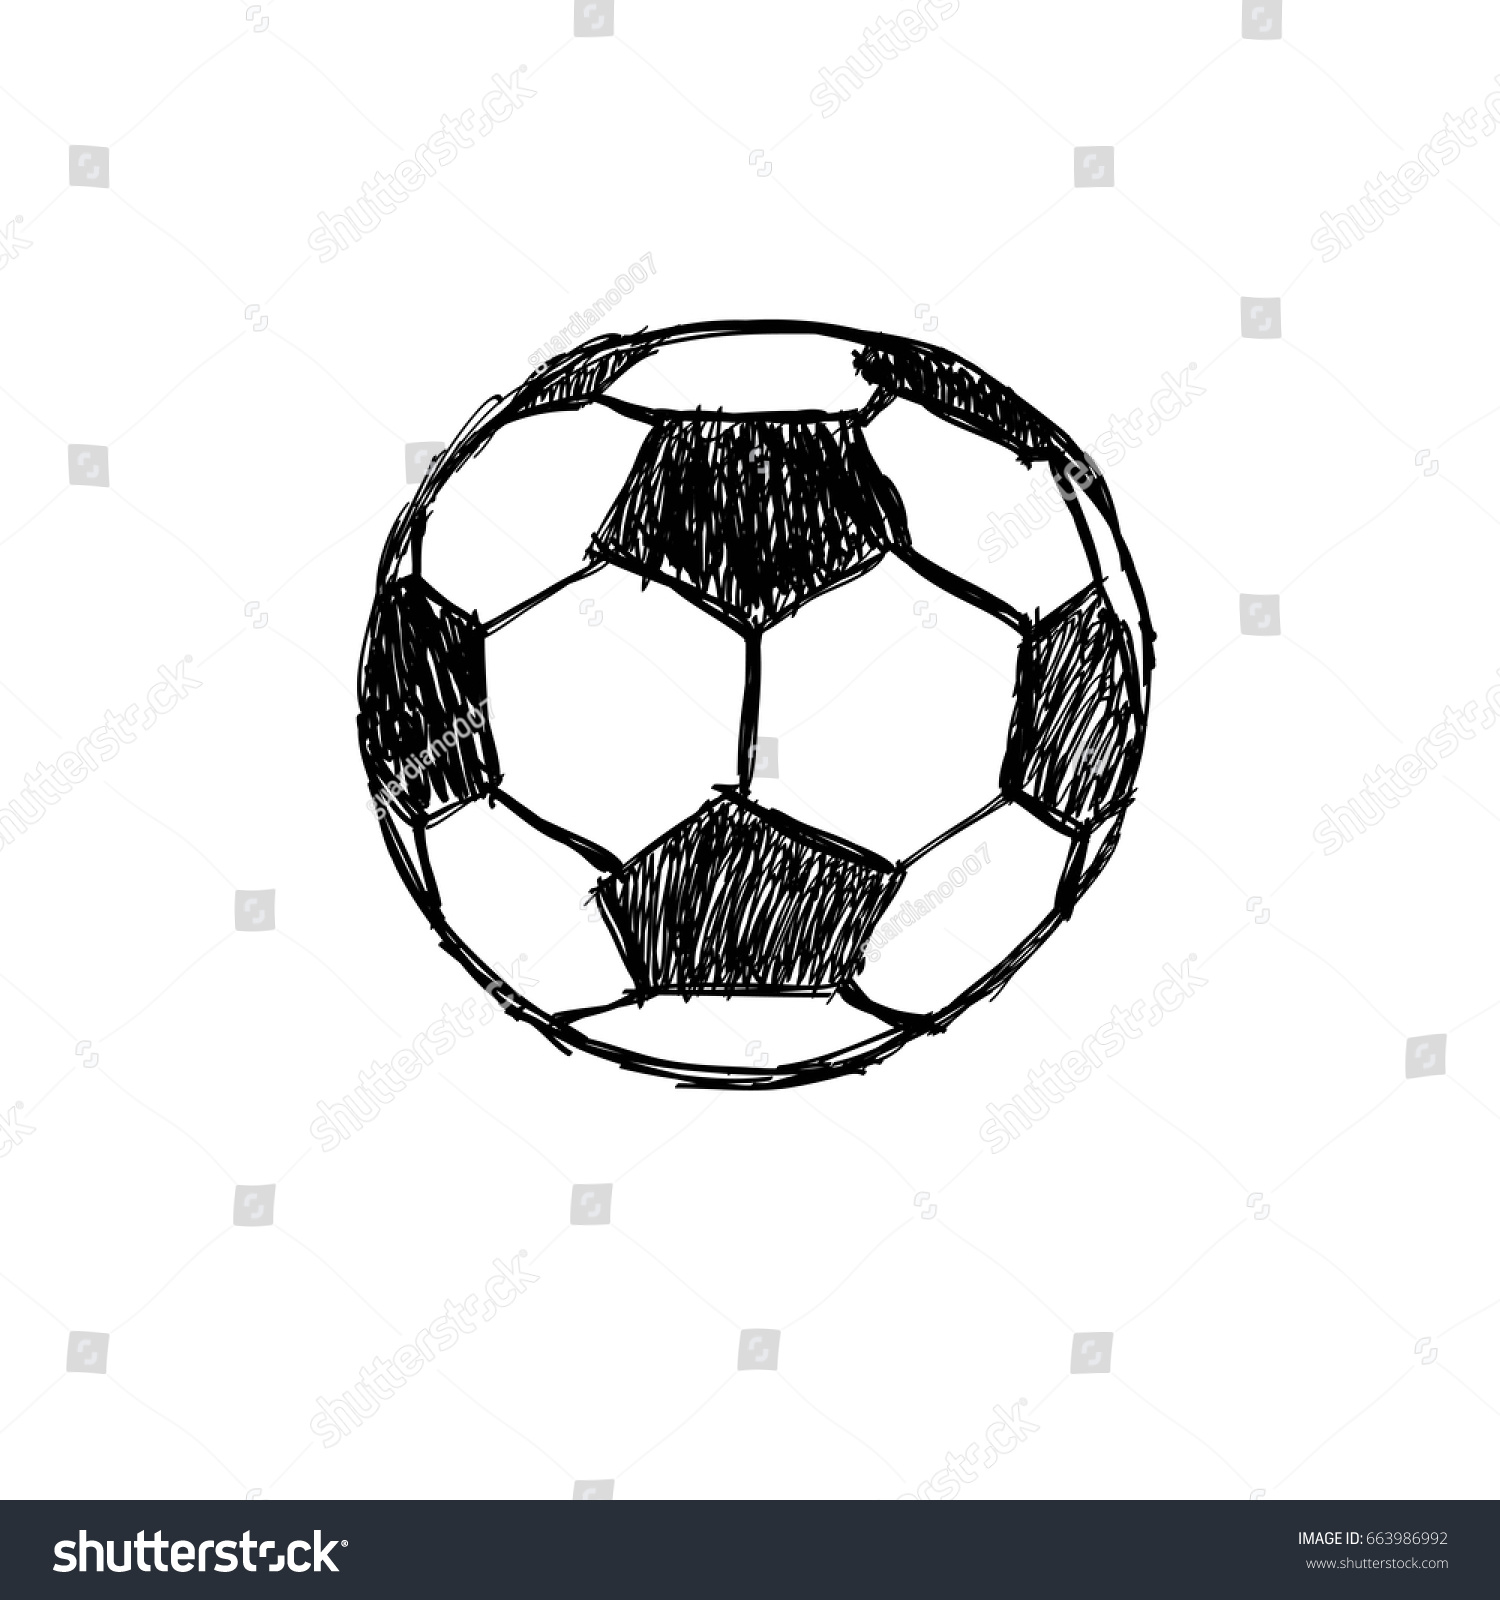 Football Soccer Ball Drawing Vector Stock Vector Royalty Free 663986992